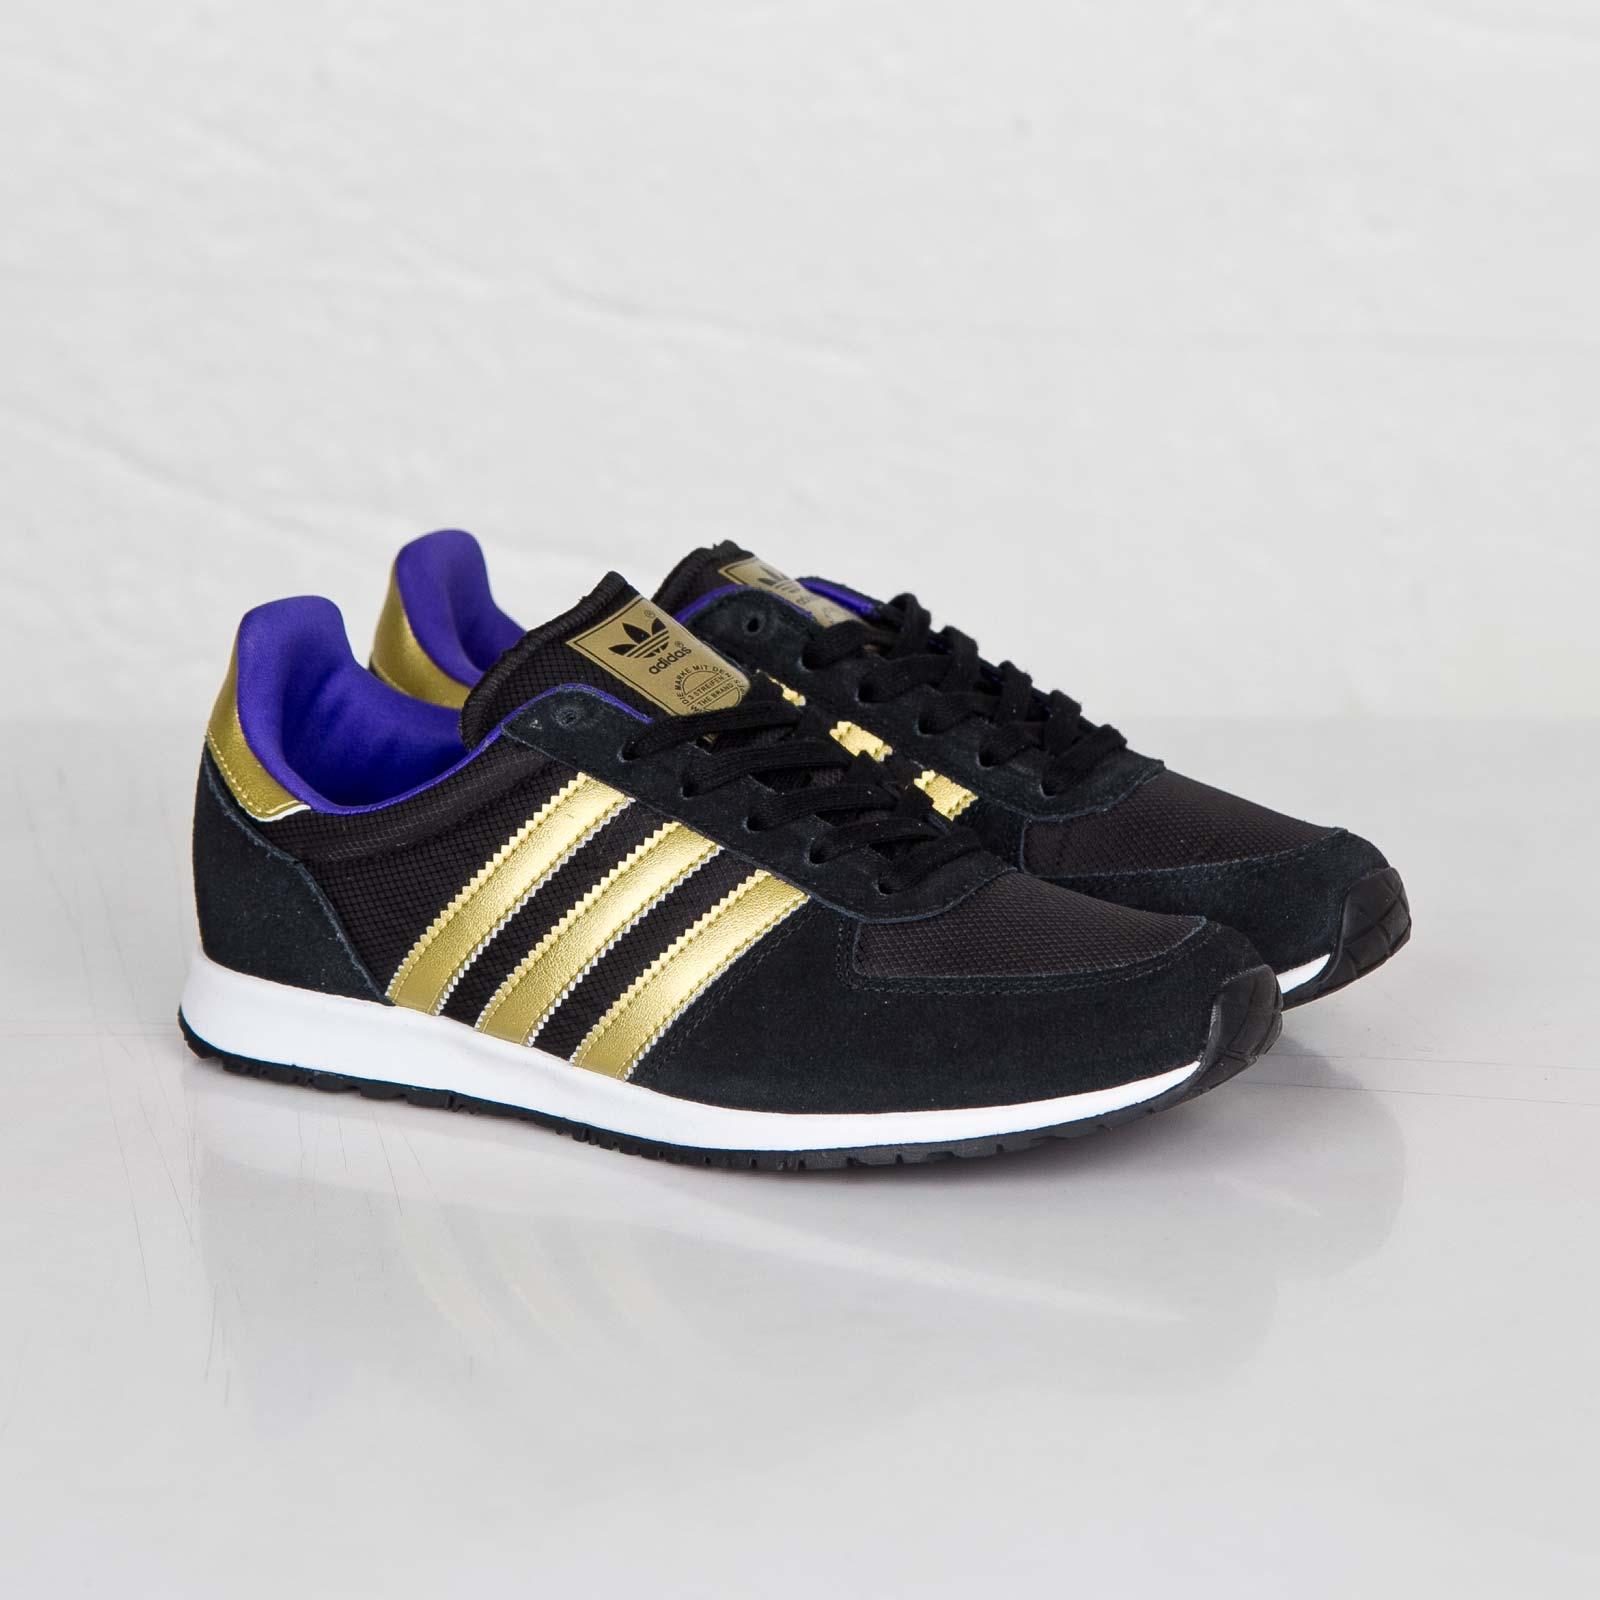 sports shoes 01d30 7e3ca adidas Adistar Racer W